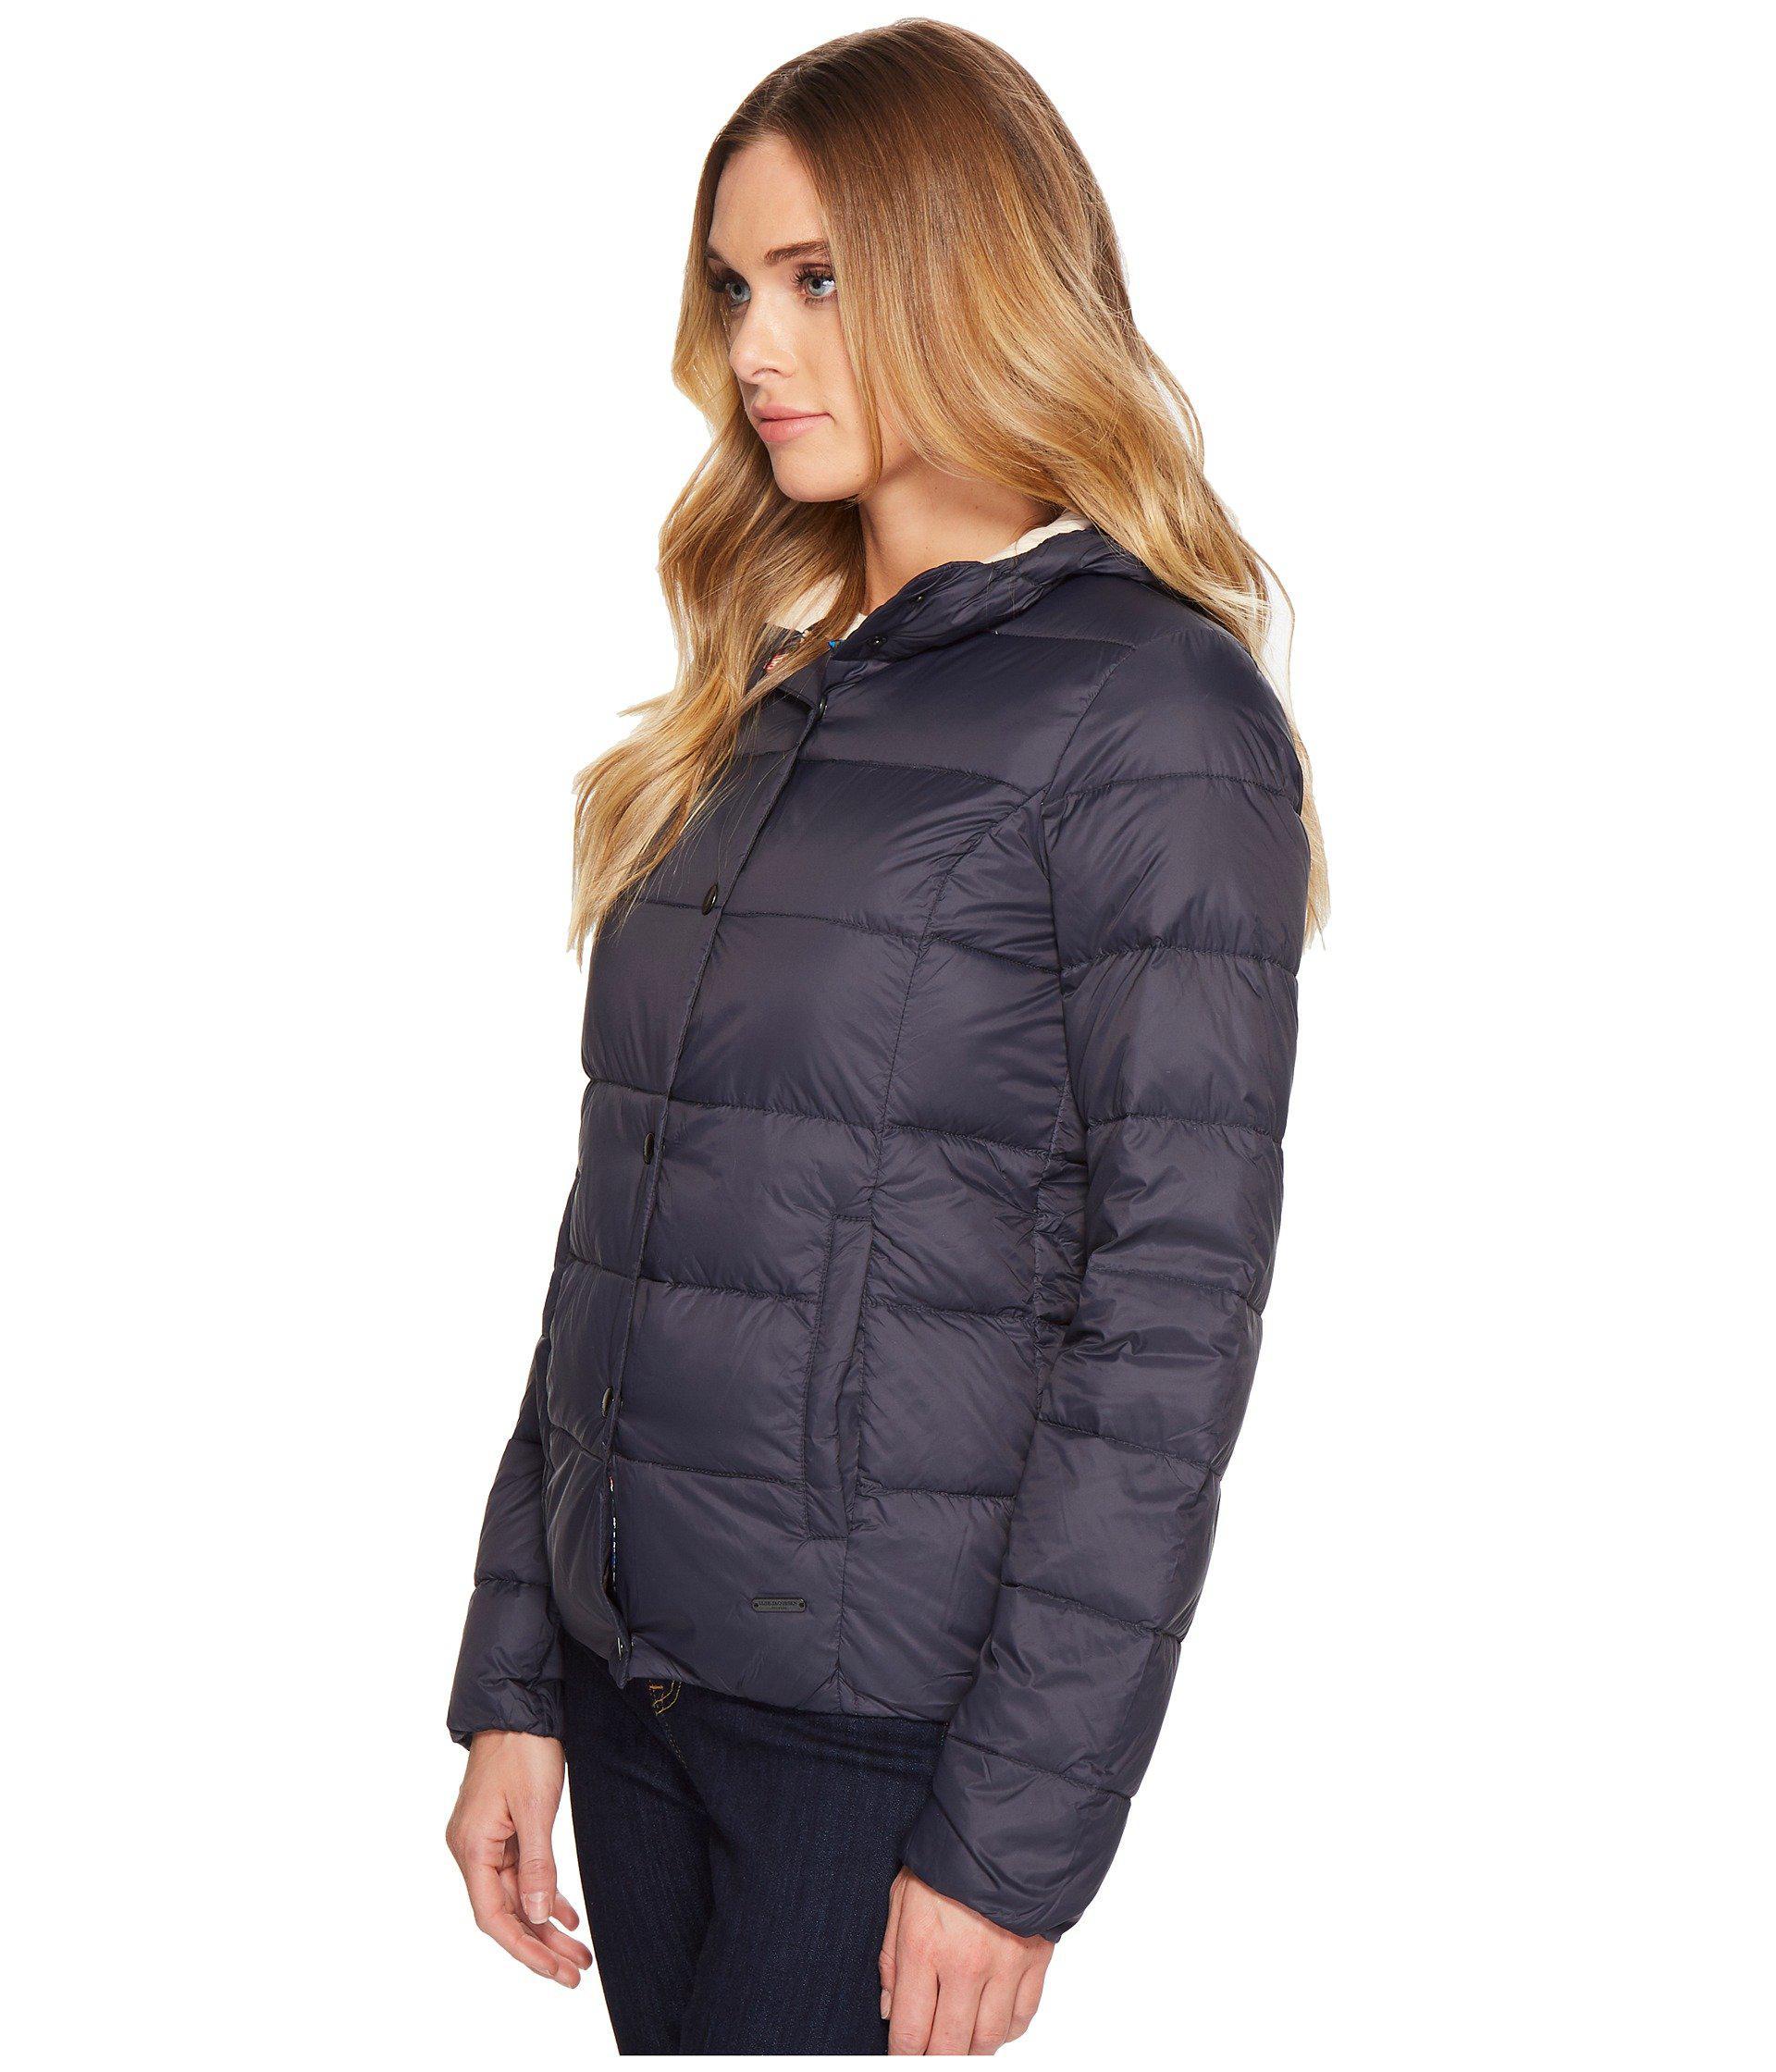 Lyst - Ilse Jacobsen Hooded Puffer Coat in Blue 62900ec9c0